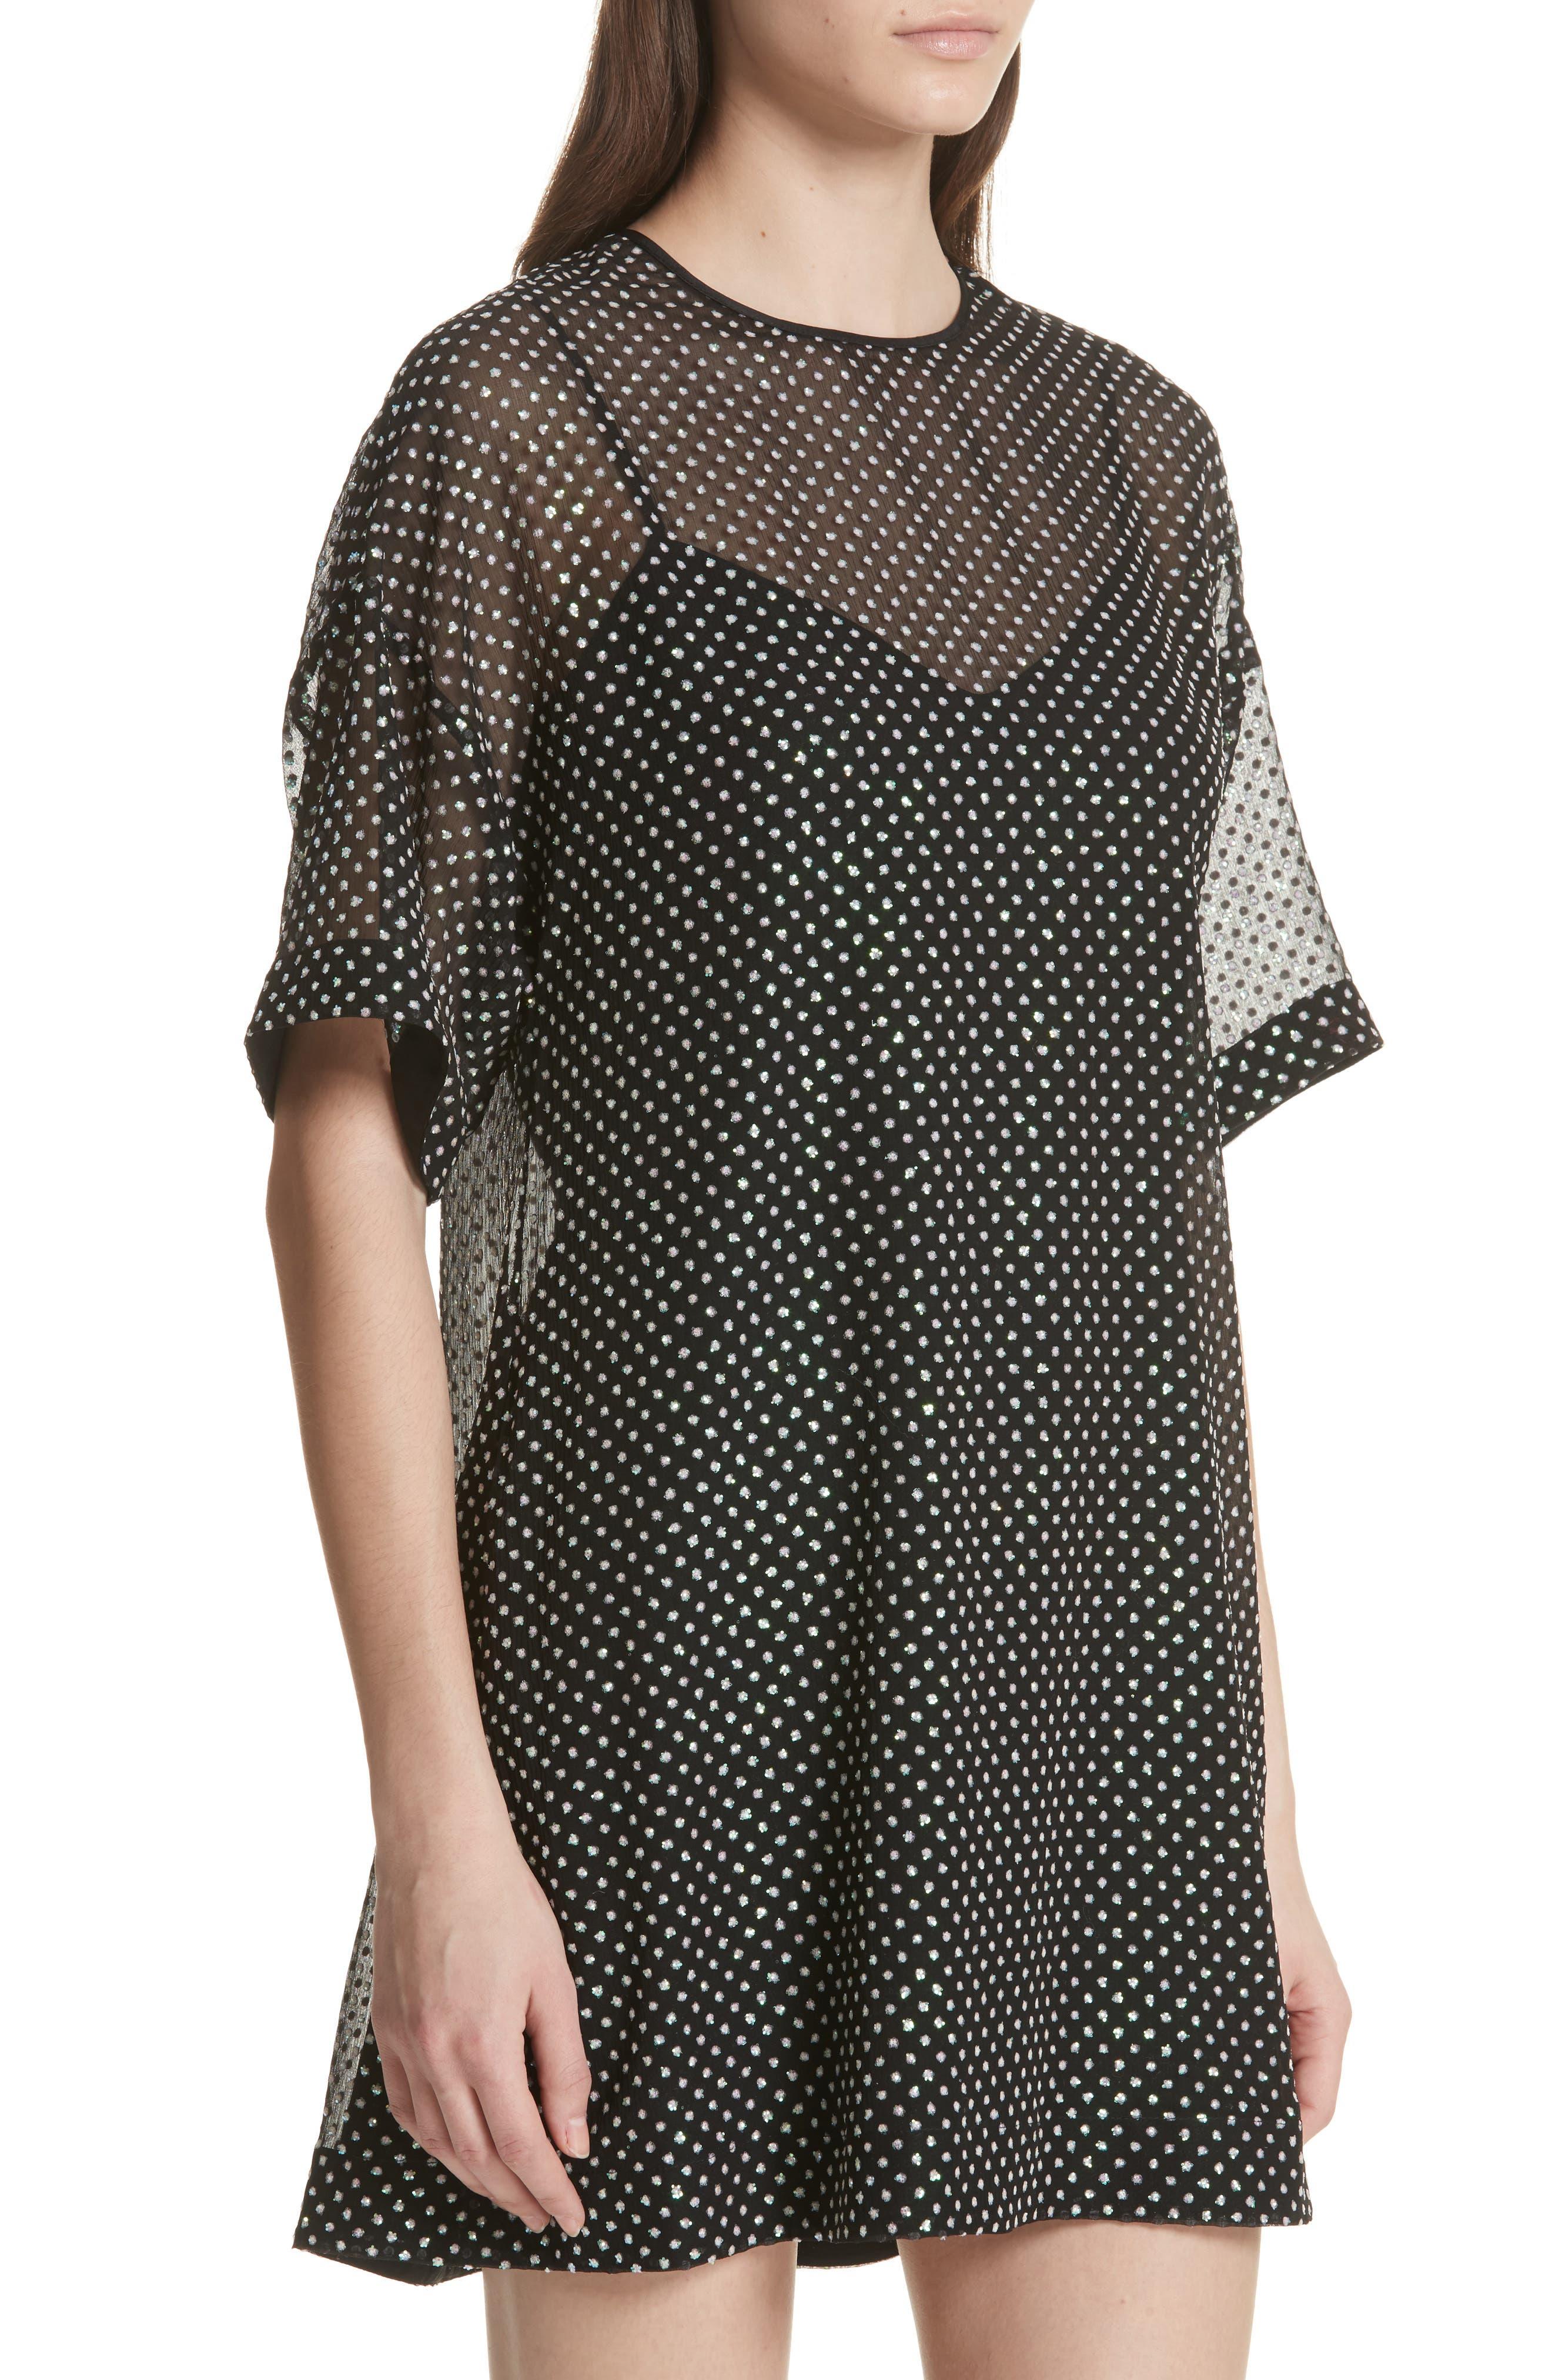 Creponne T-Shirt Dress,                             Alternate thumbnail 4, color,                             Black